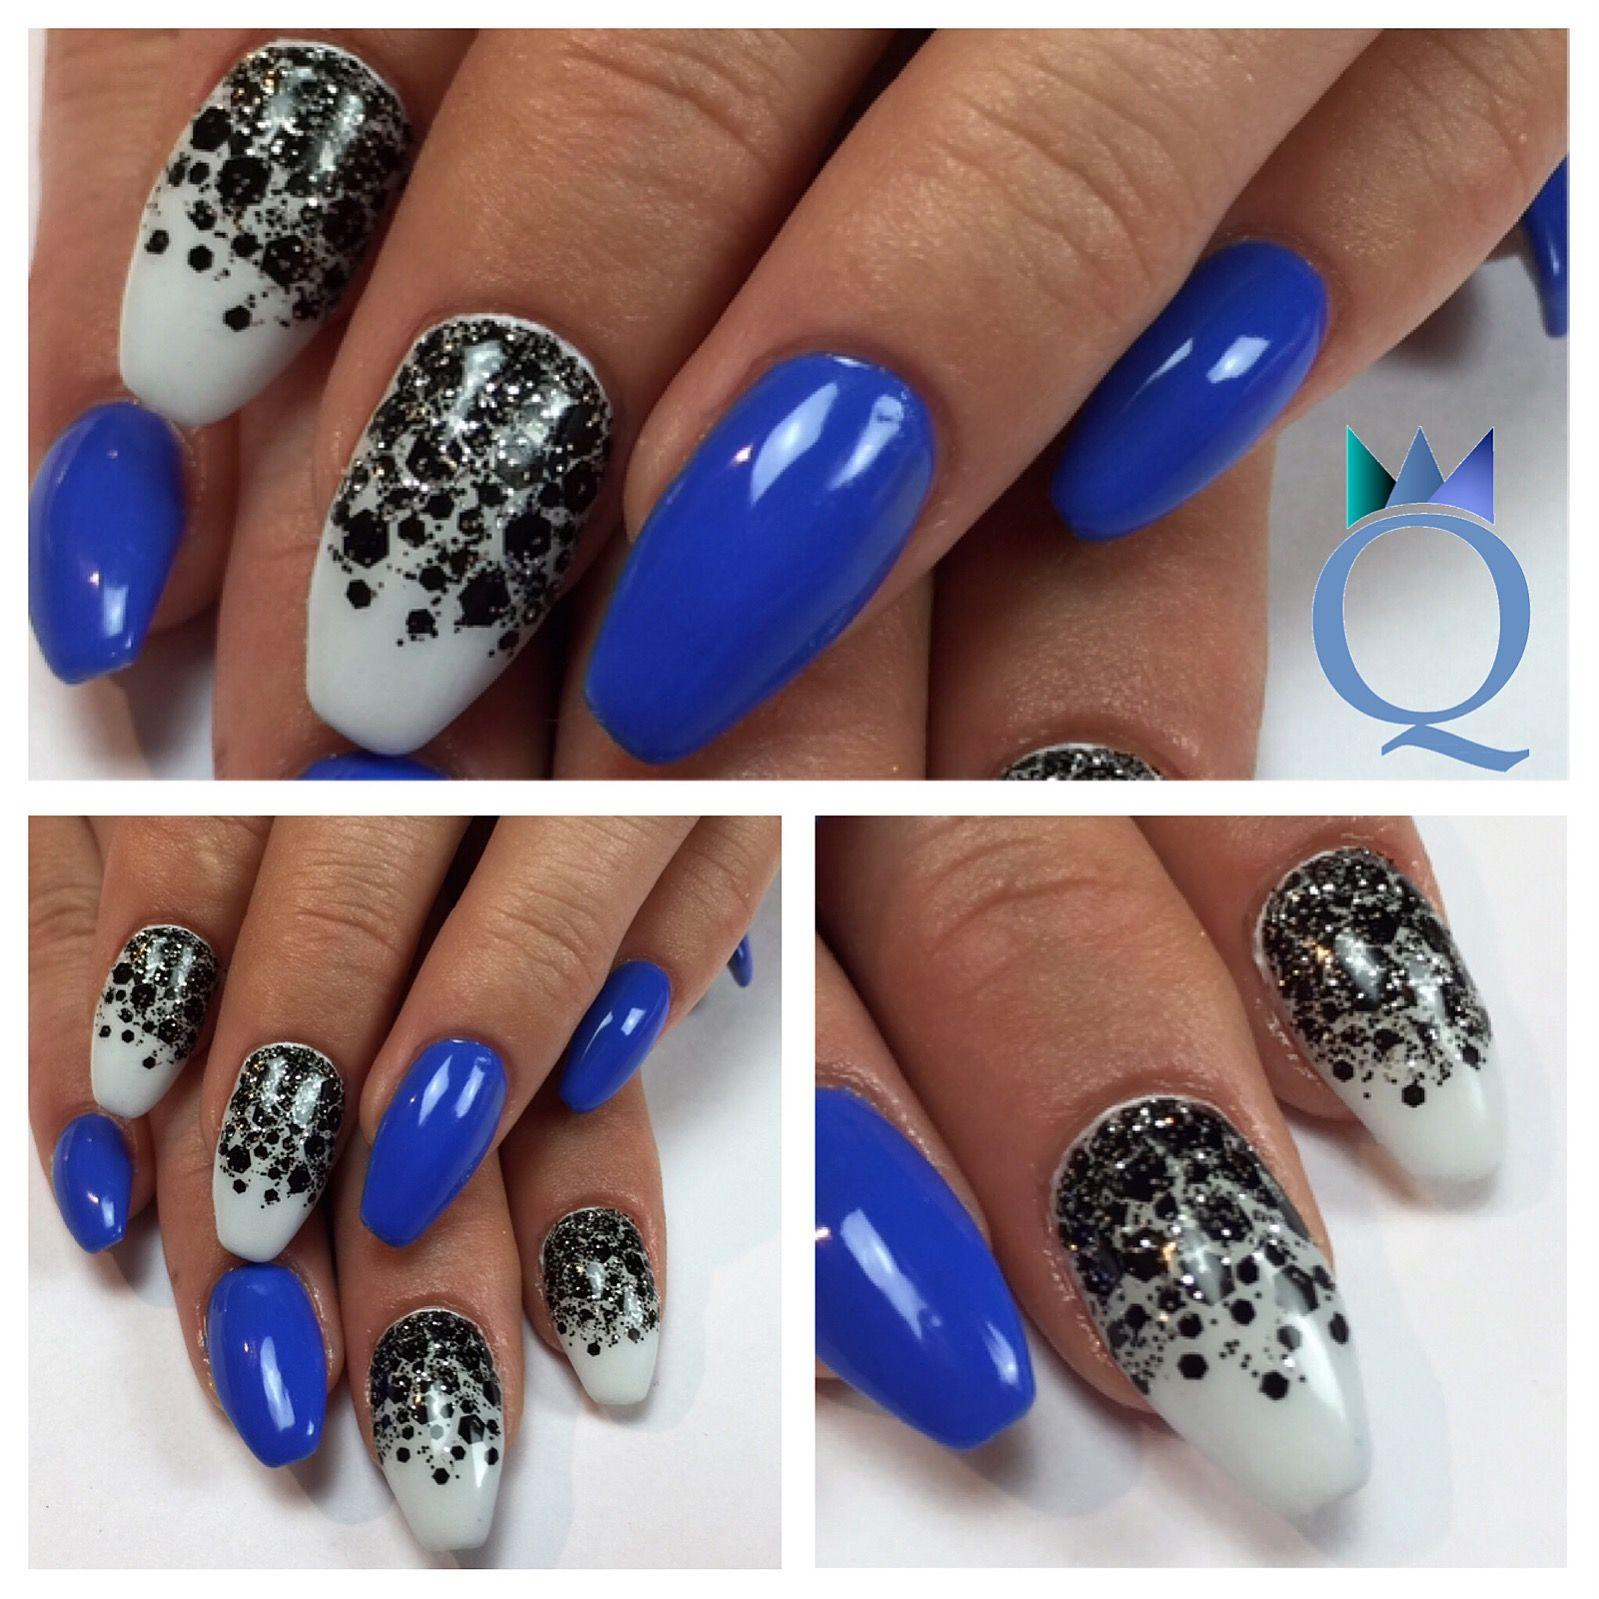 coffinnails #gelnails #nails #blue #iceblue #black #glitter ...